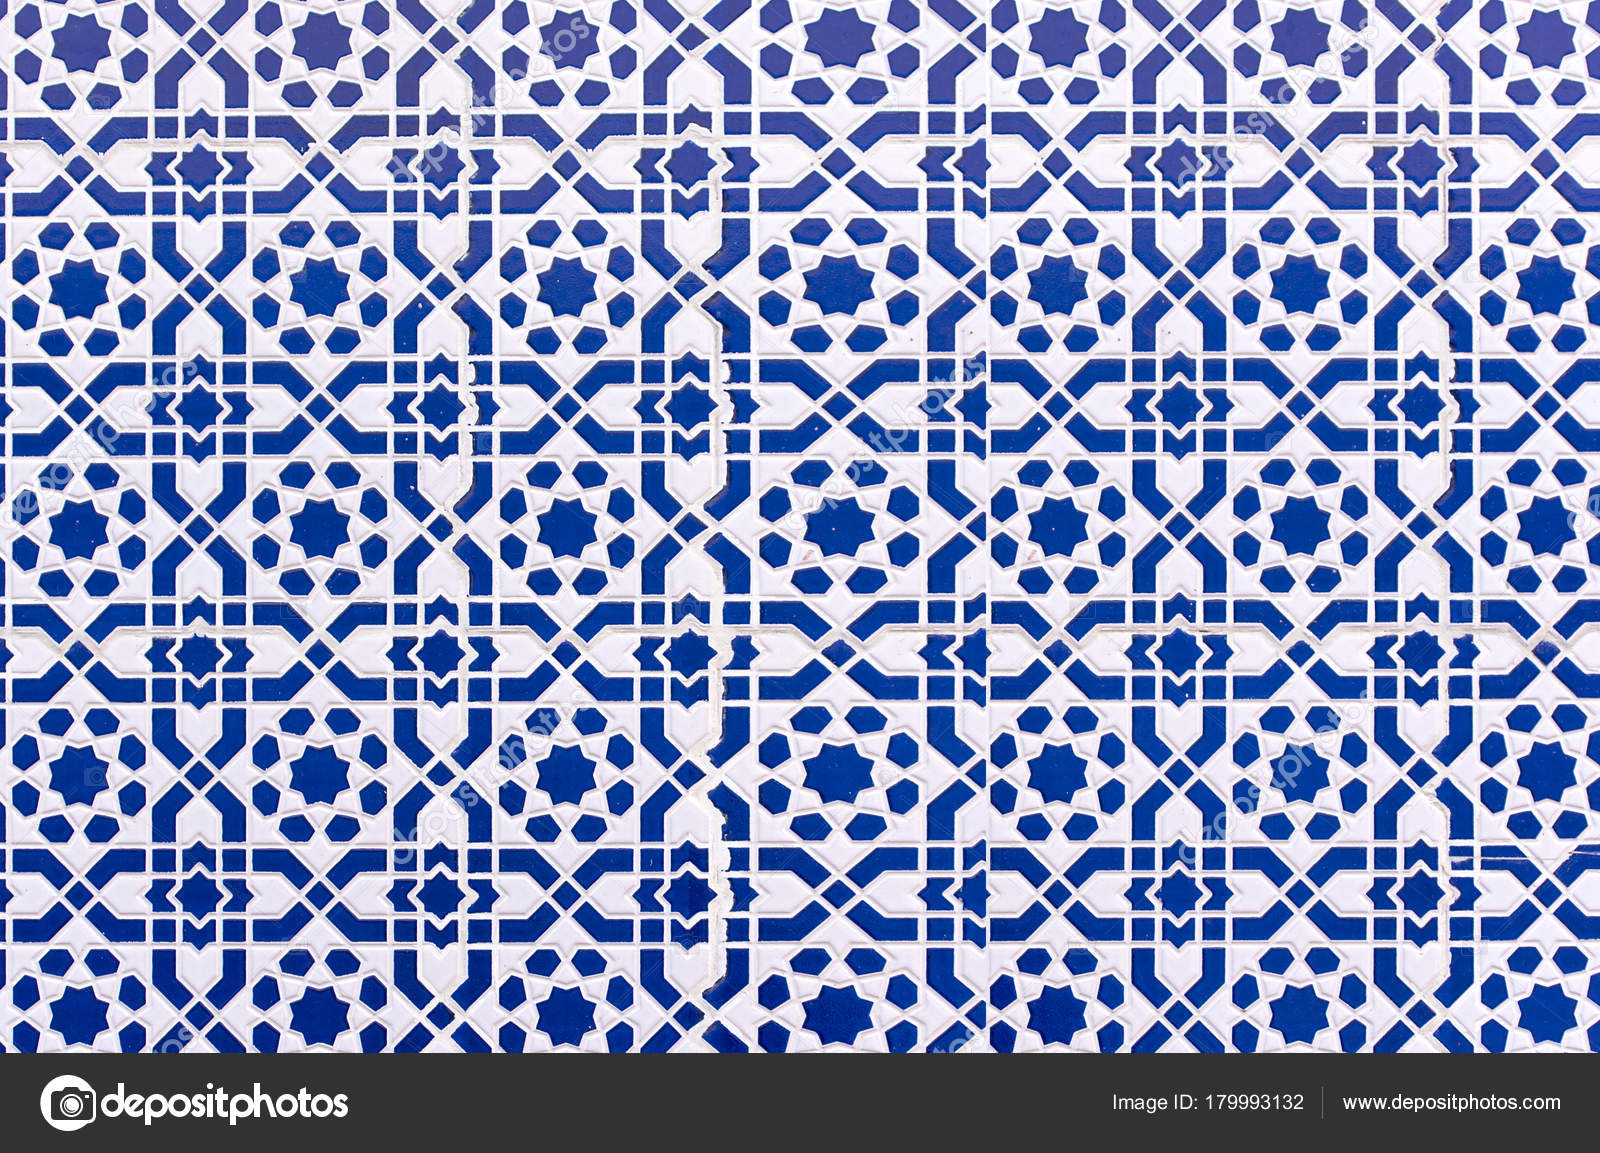 Moroccan Tiles Traditional Arabic Patterns Ceramic Tiles Patterns ...